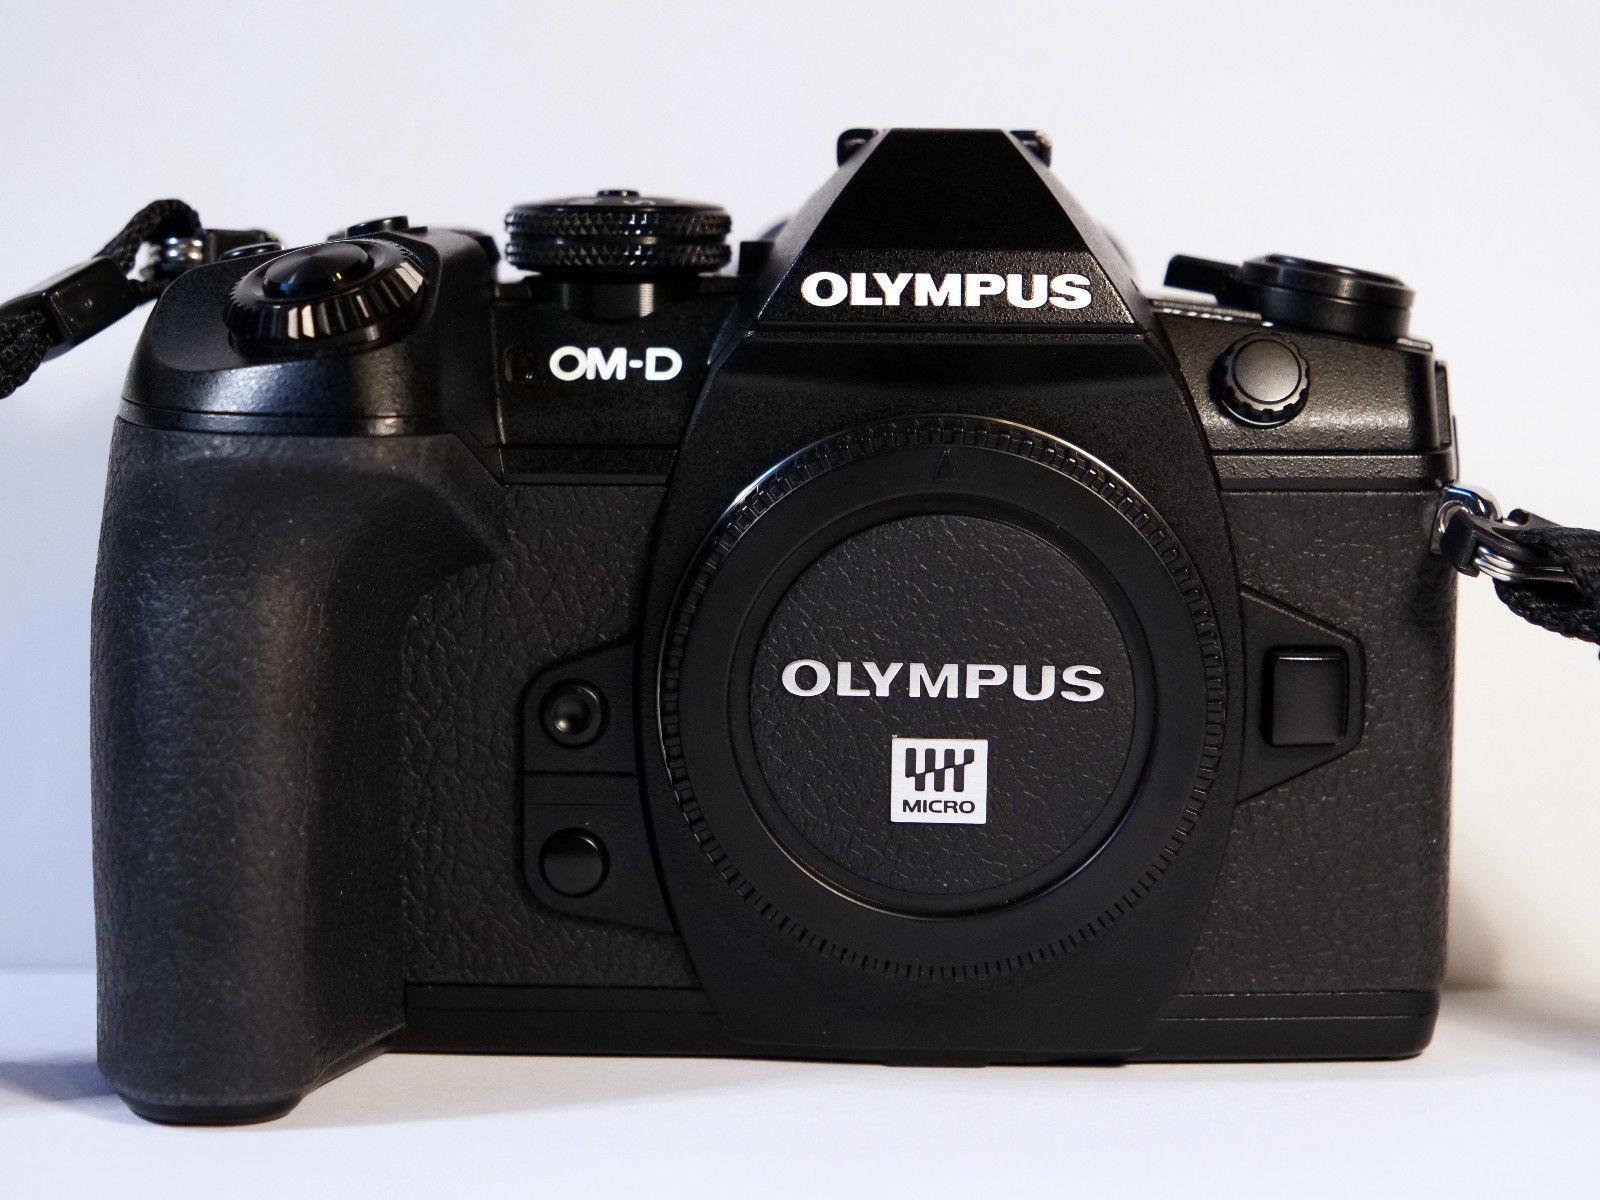 Olympus OM-D E-M1 Mark II Body - nur 1384 Auslösungen